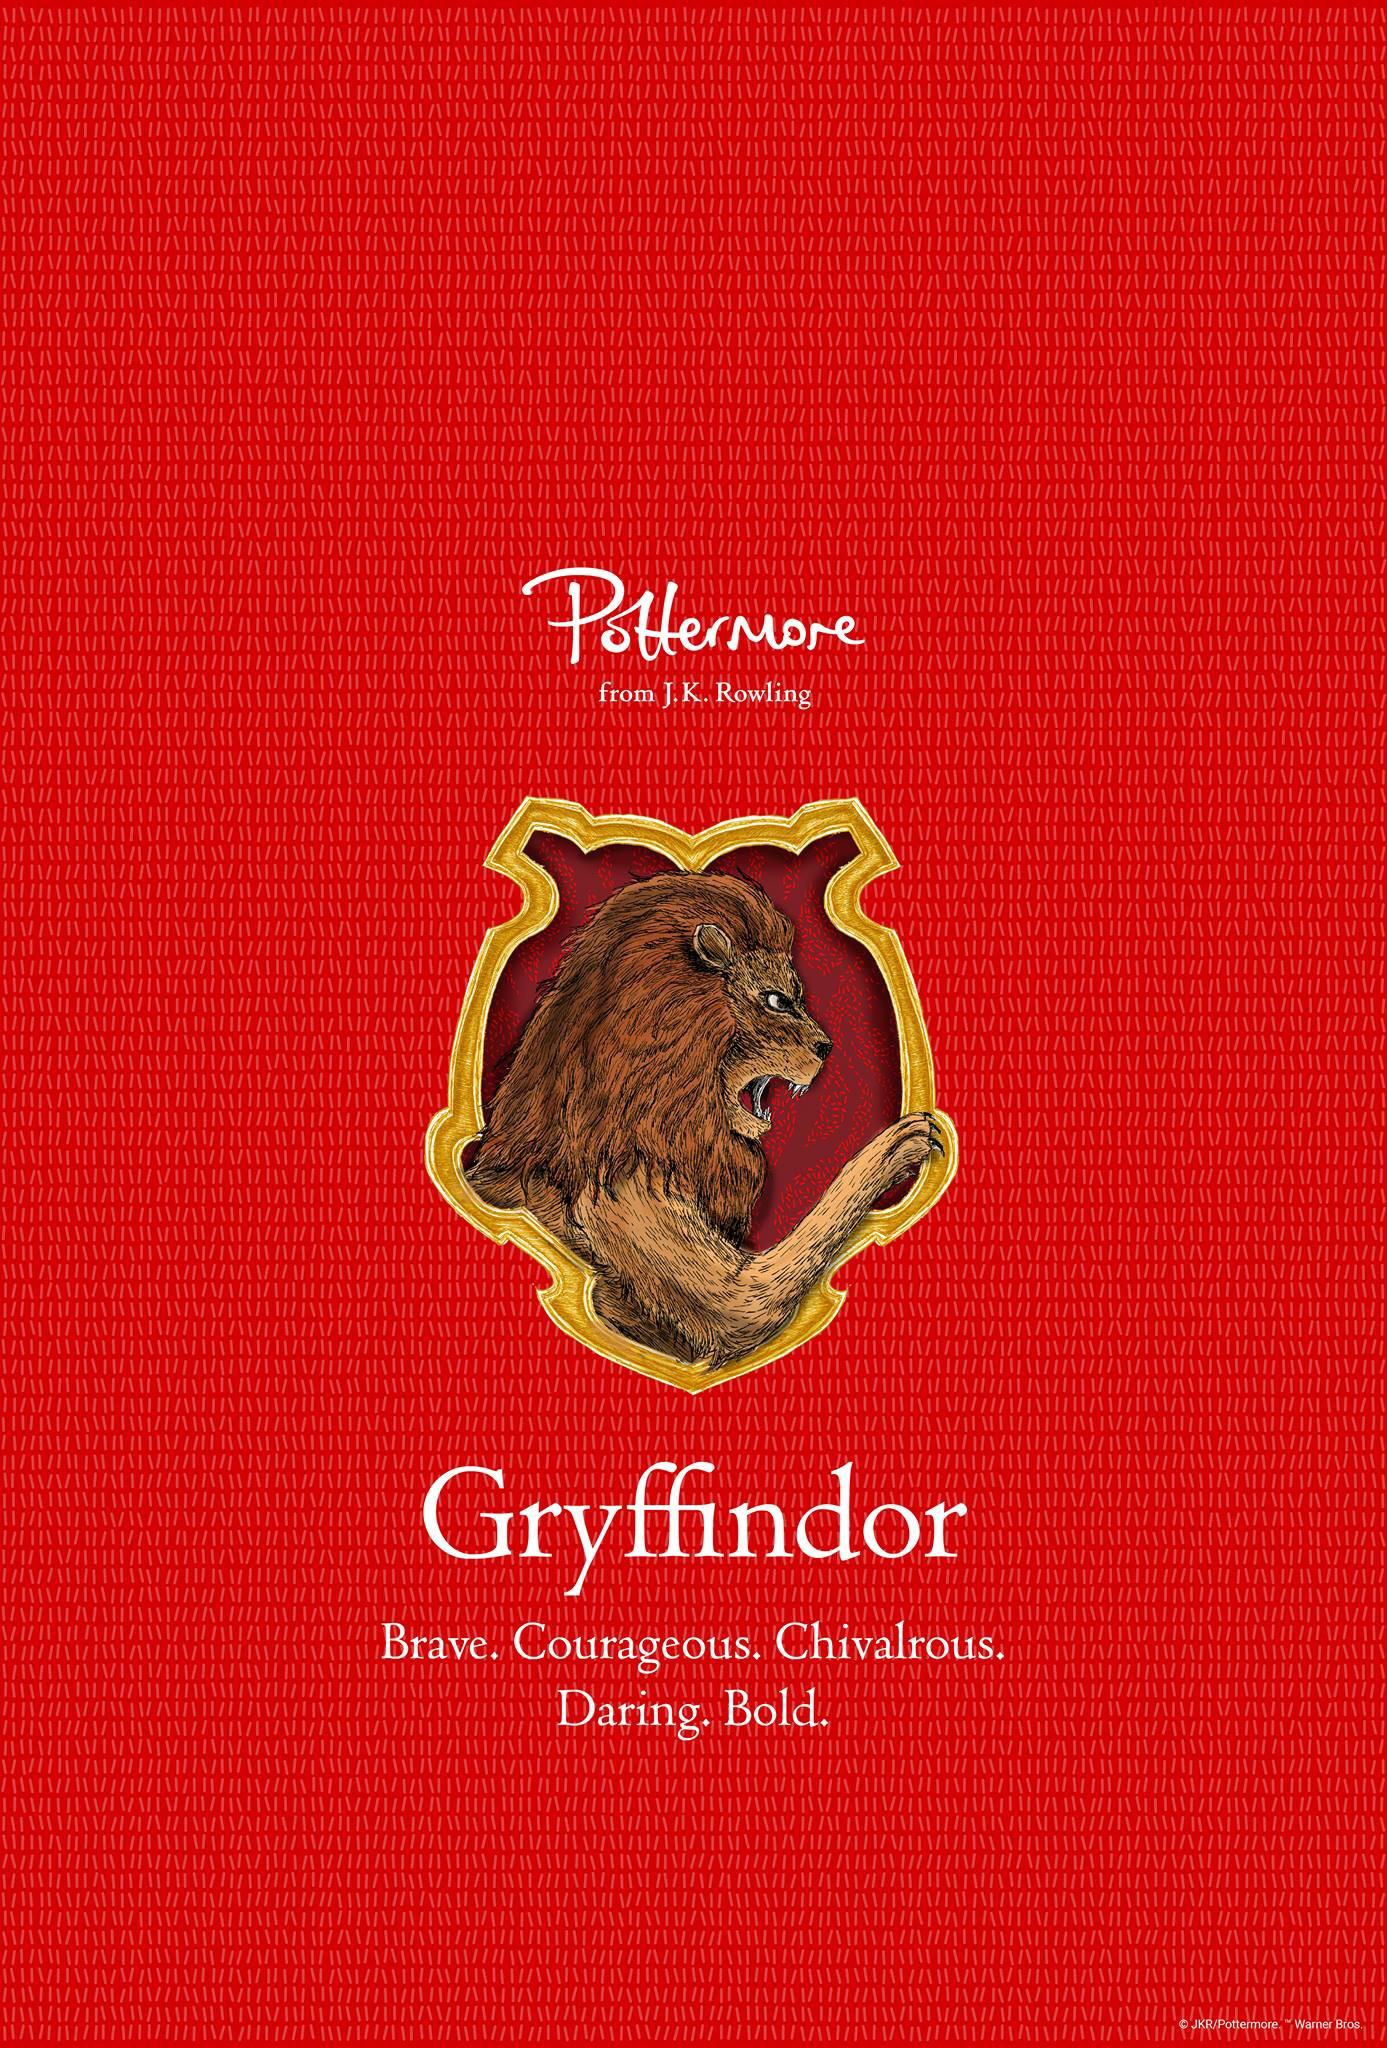 Pottermore Gryffindor Wallpaper. CultureWallpapersHouseHogwartsHarry PotterBeautiful  Backgrounds